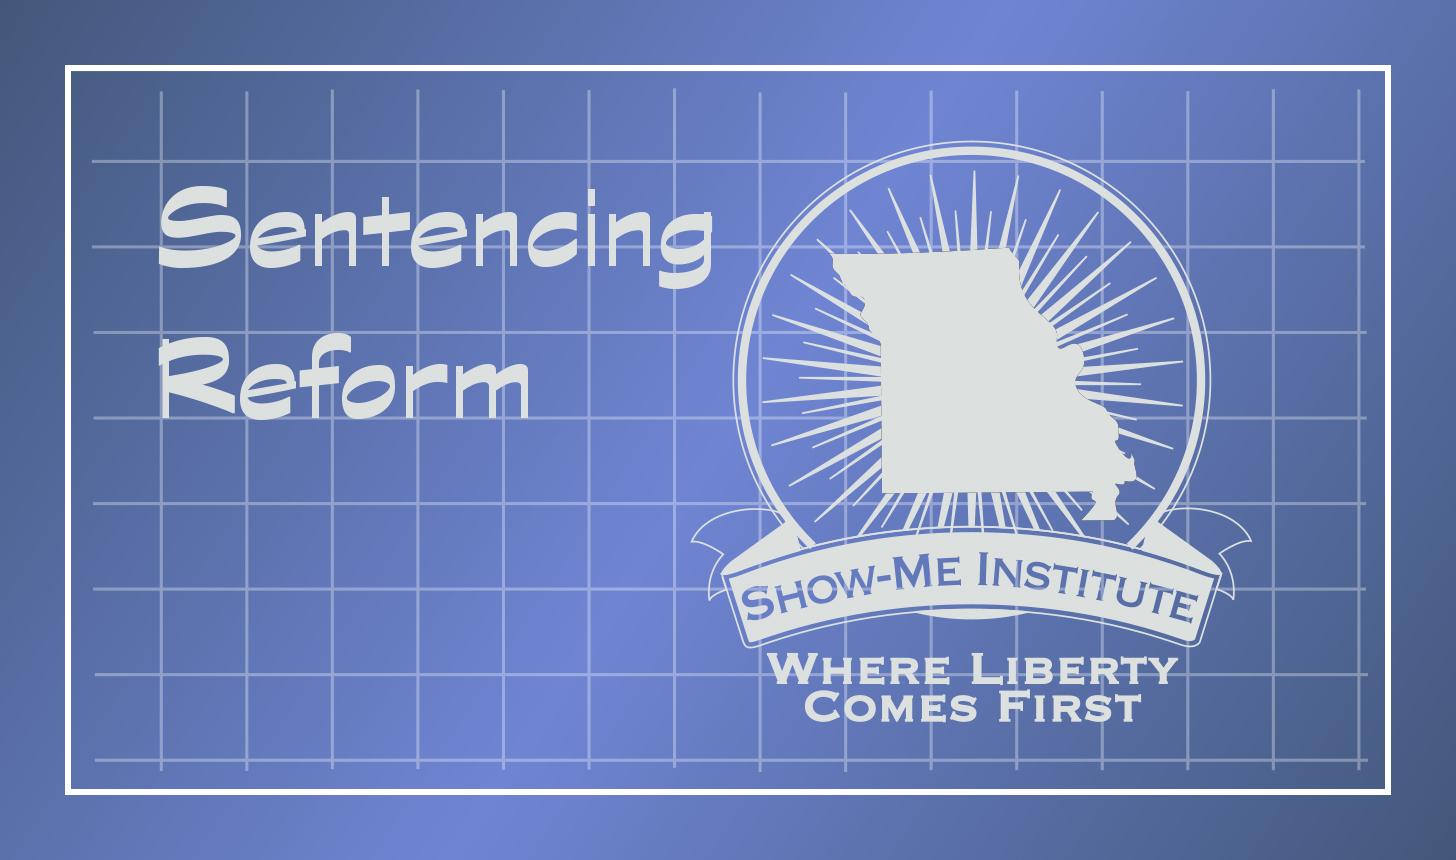 2018 blueprint sentencing reform show me institute 2018 blueprint sentencing reform malvernweather Gallery